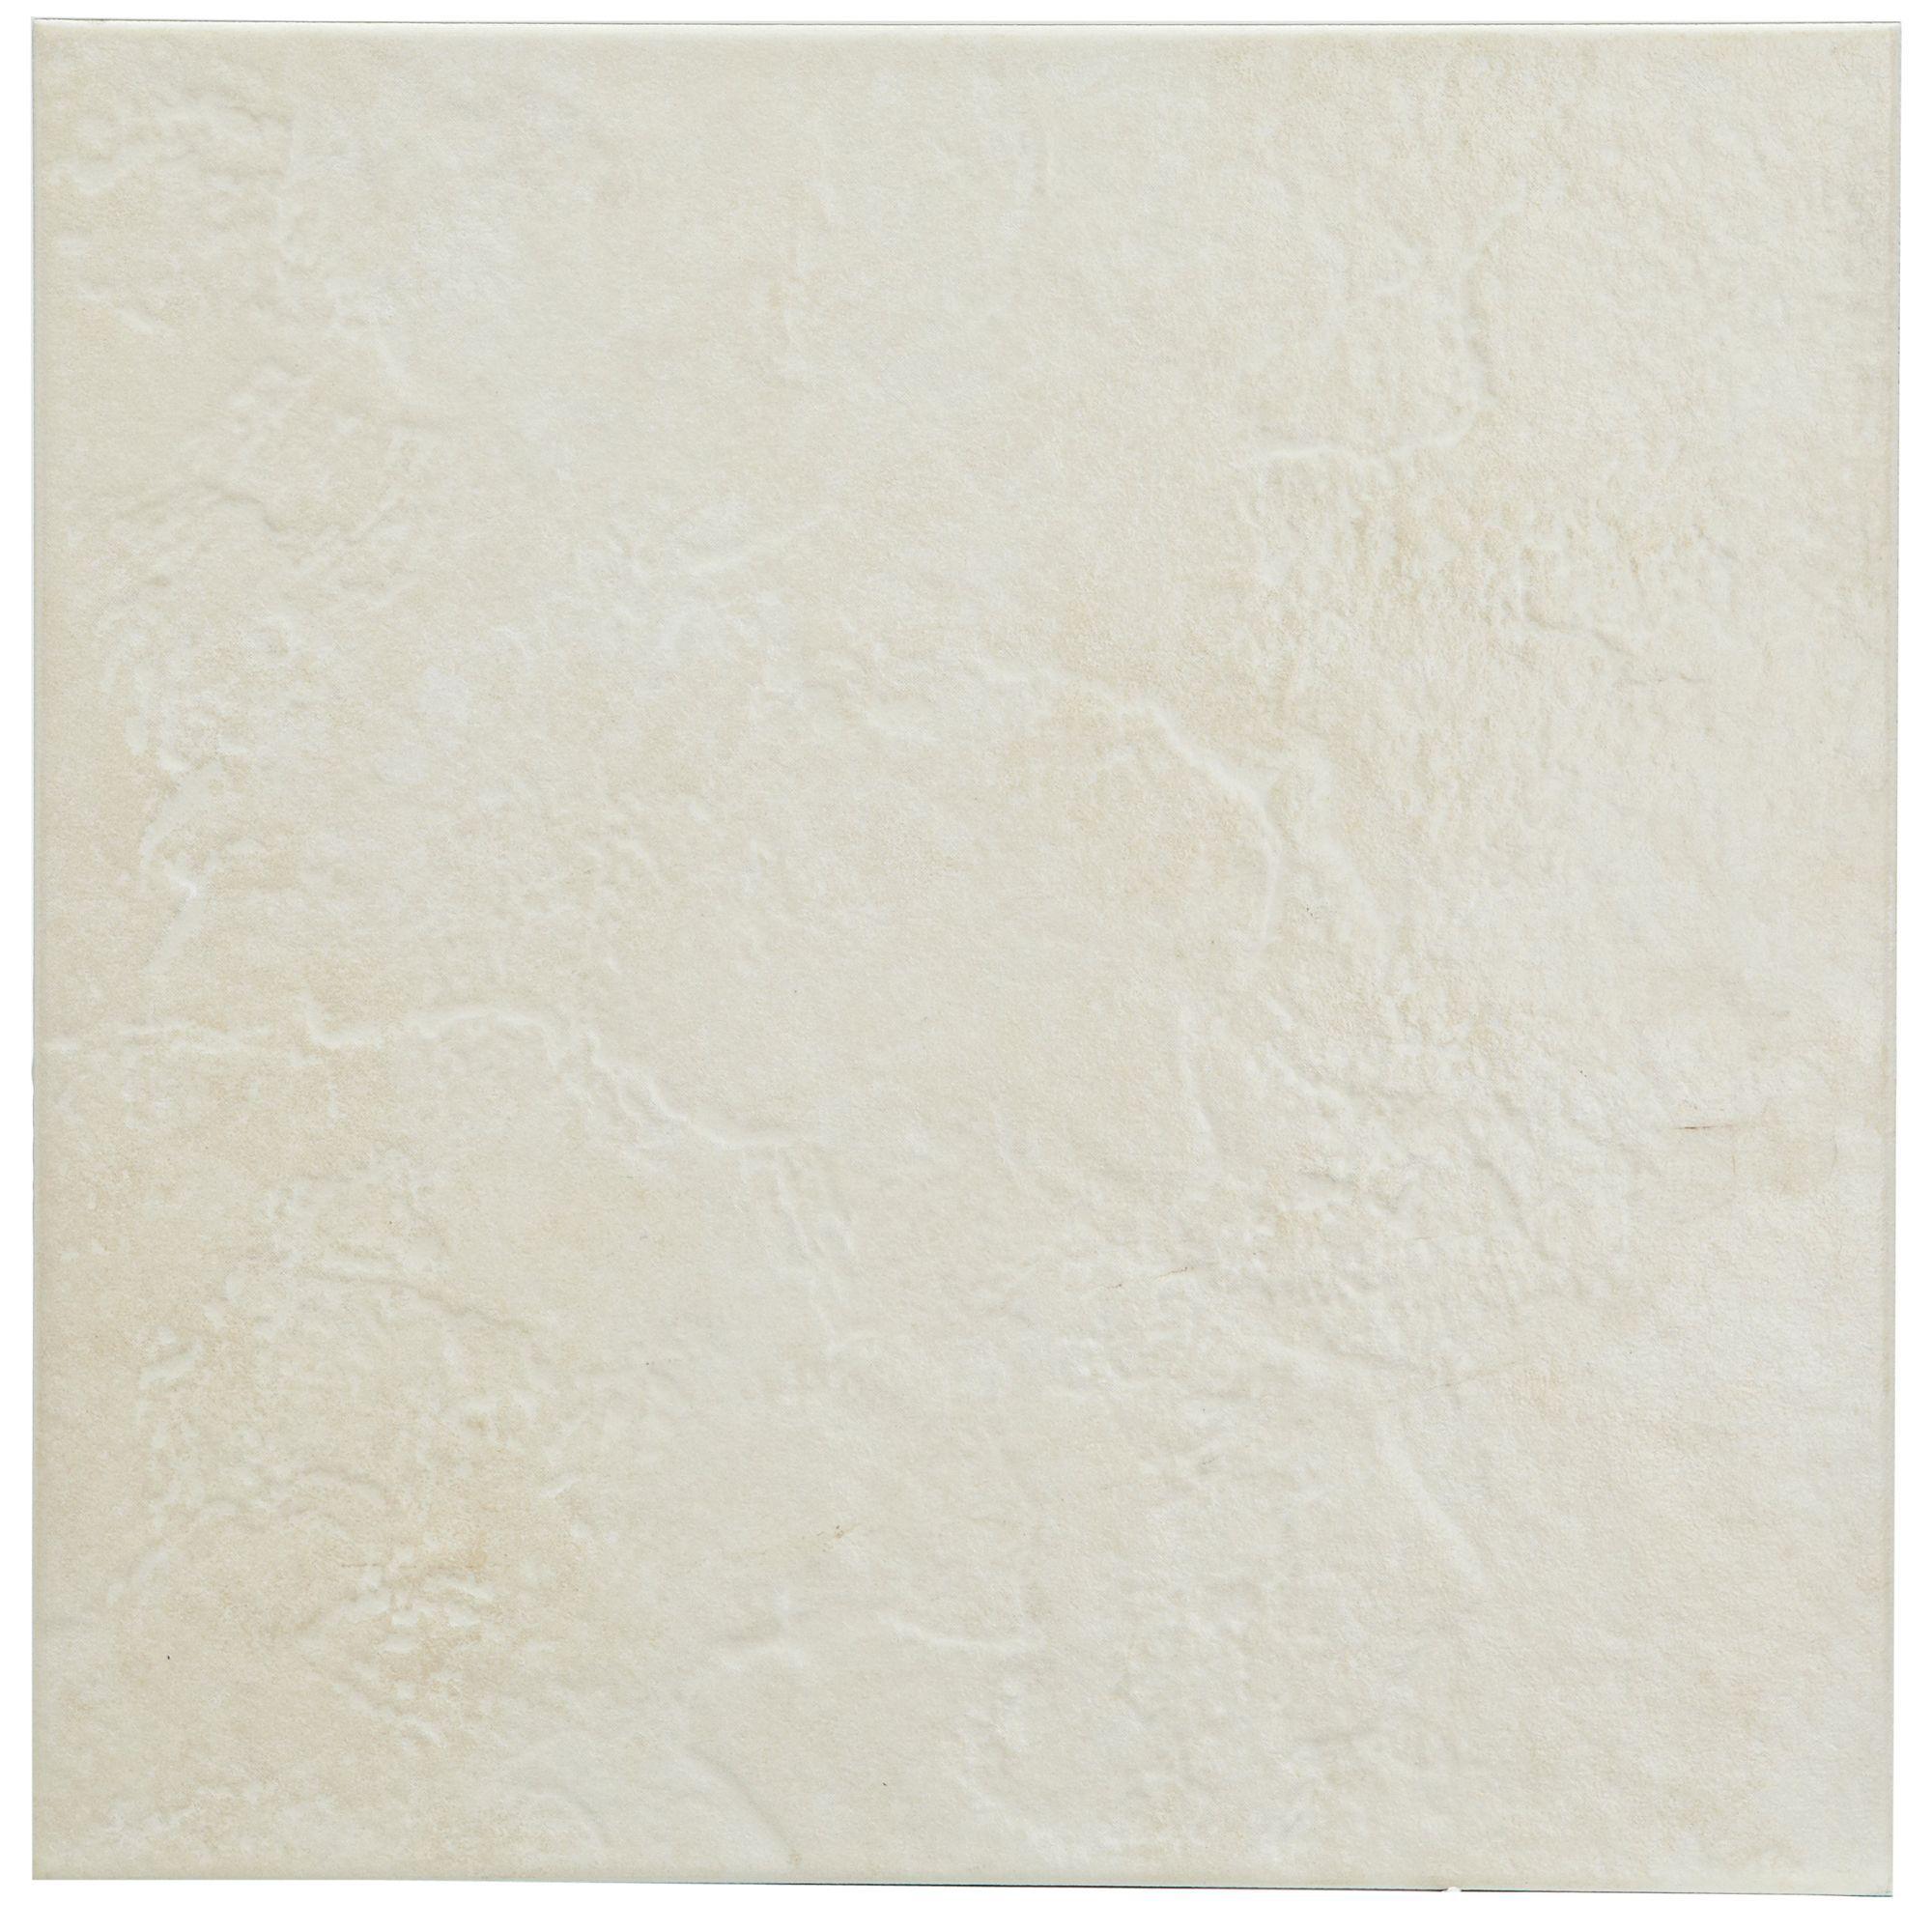 Cirque Beige Stone Effect Ceramic Floor Tile, Pack Of 9, (l)333mm (w)333mm